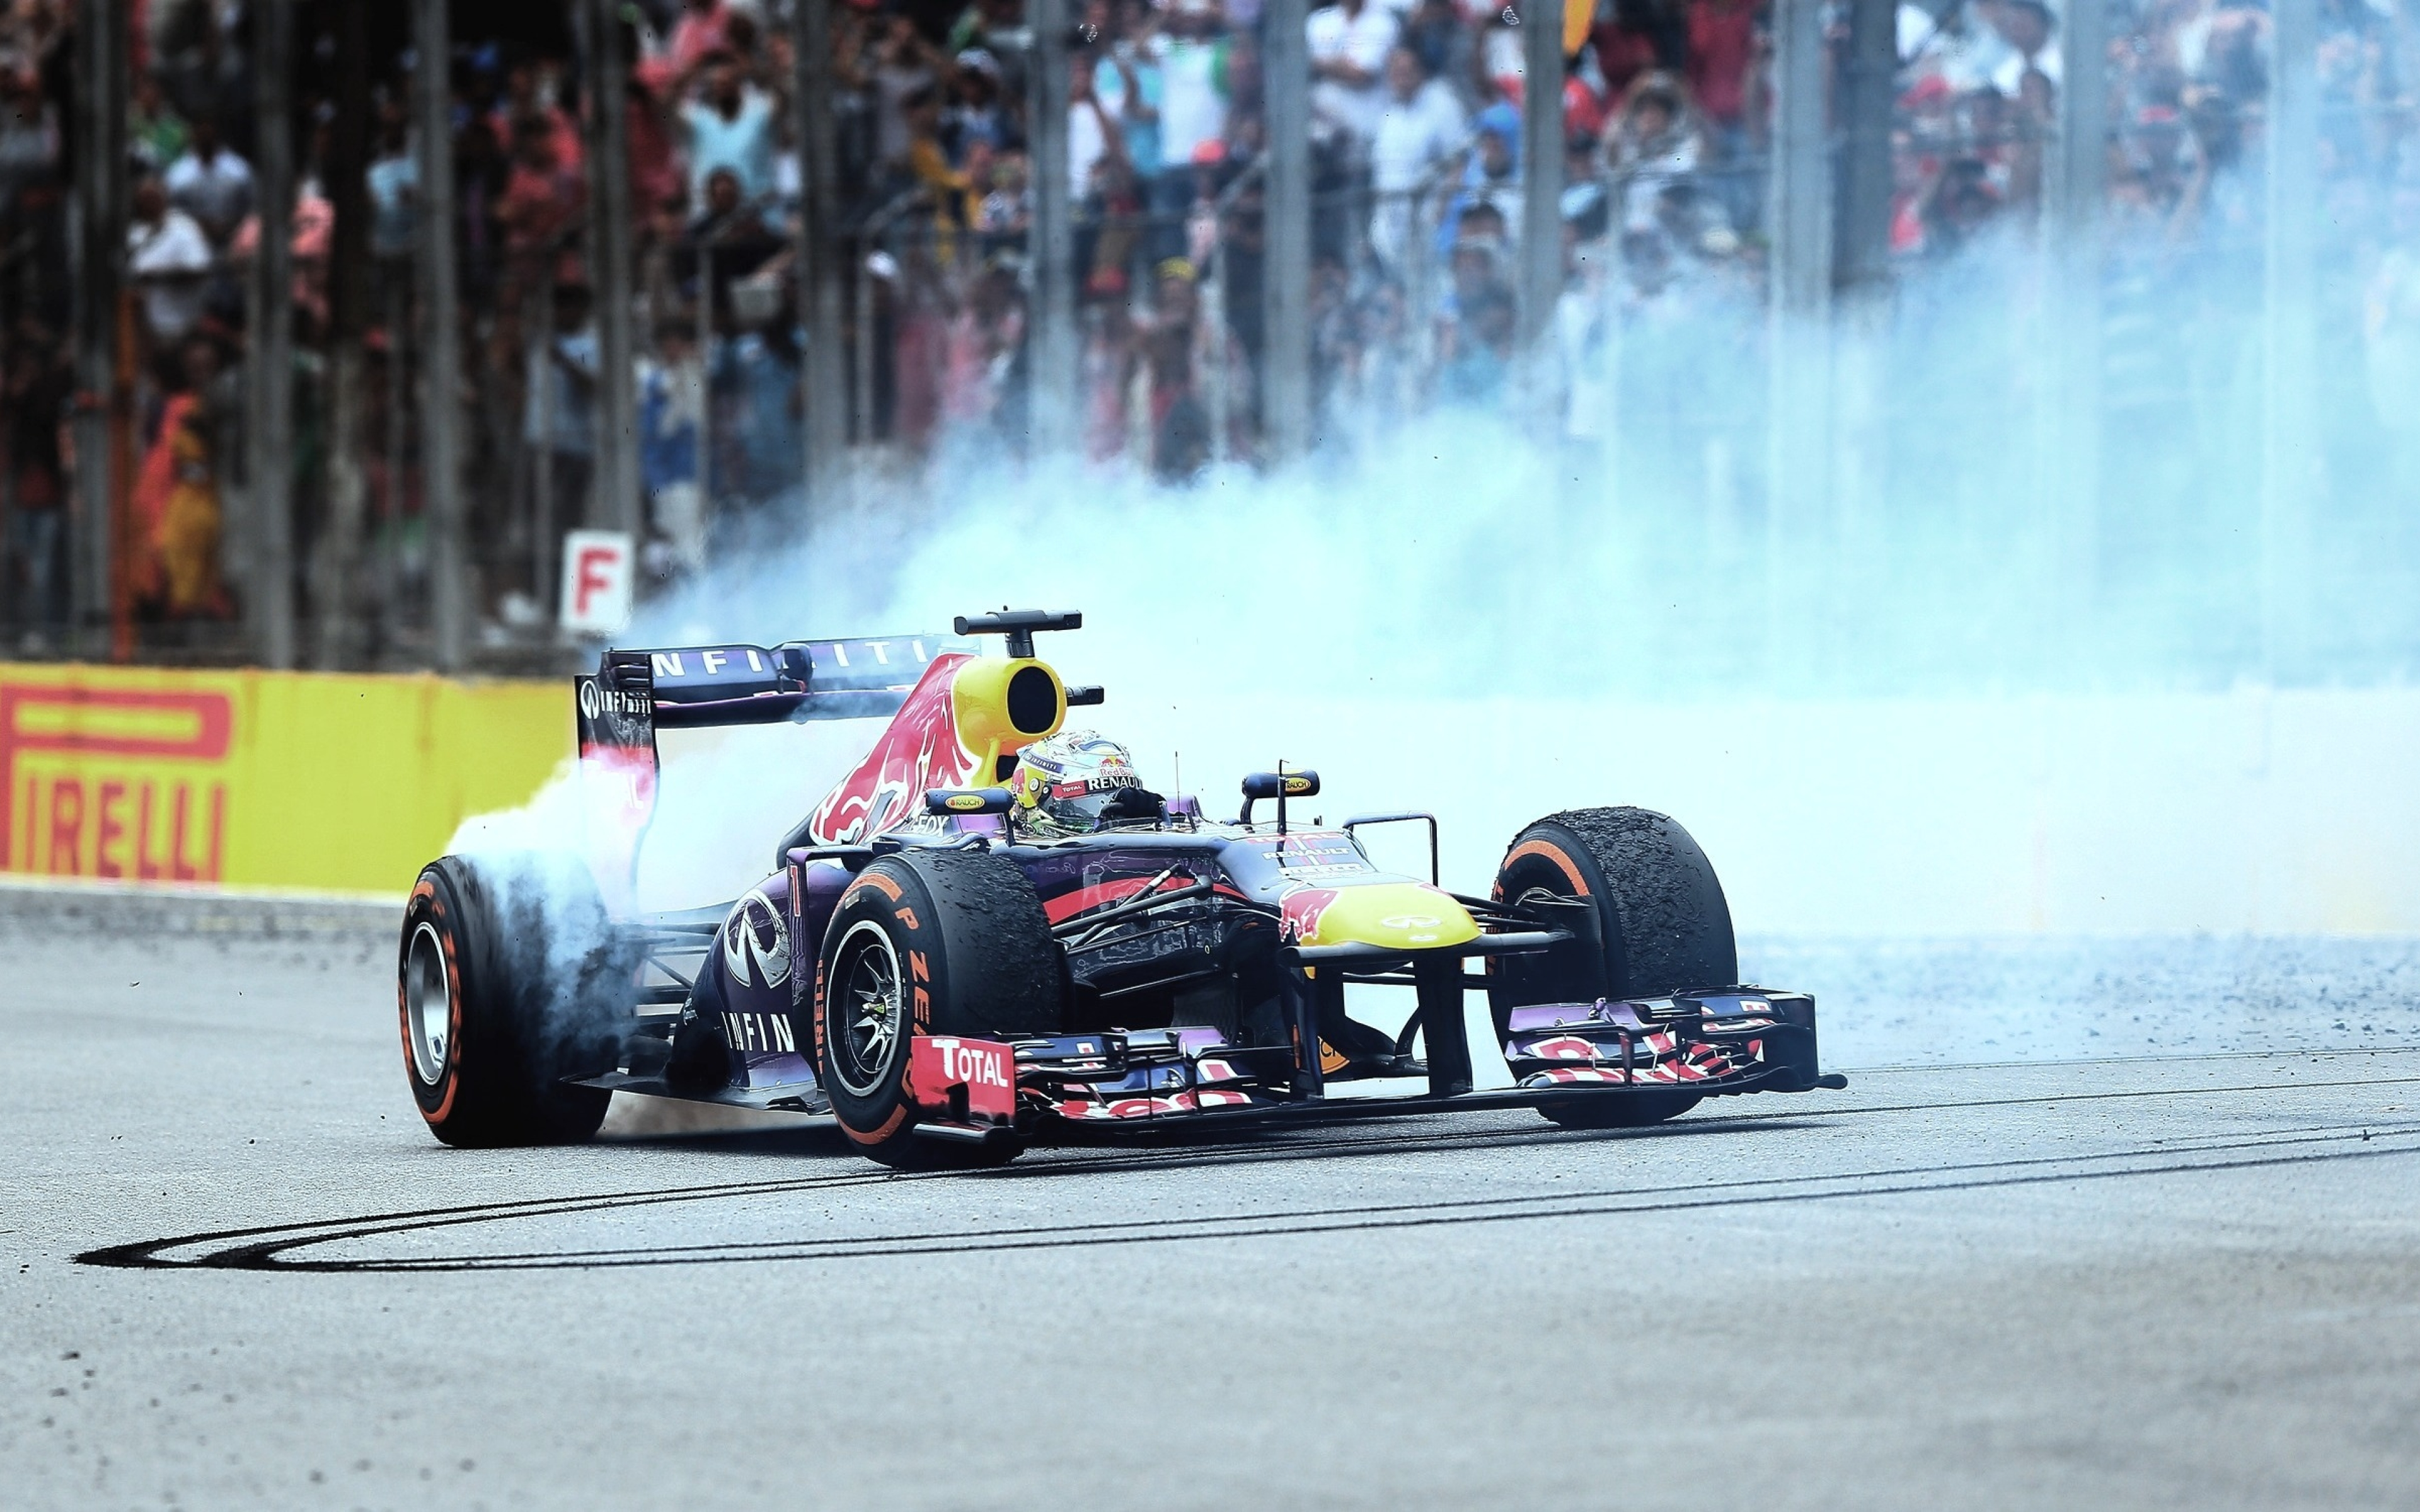 10 Top Mclaren F1 Wallpaper 1920x1080 Full Hd 1080p For Pc: Formula 1, Vettel, F1, Full HD 2K Wallpaper